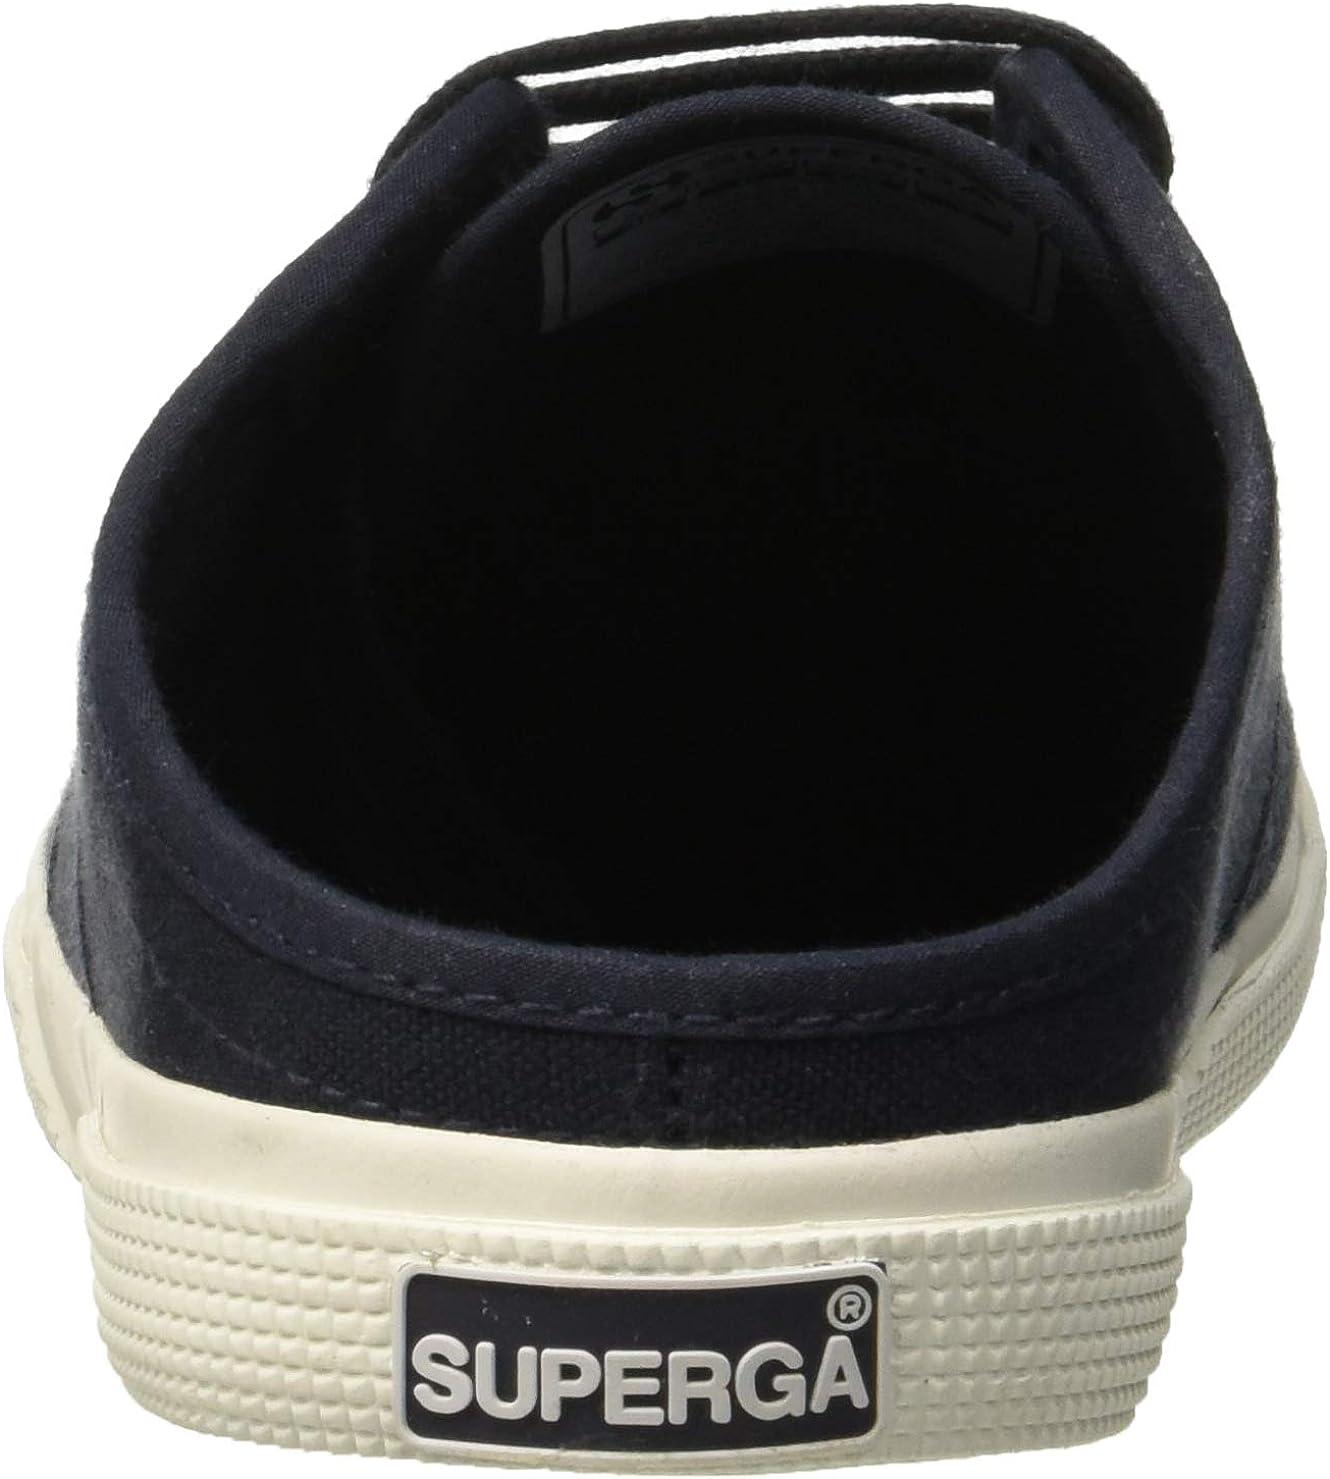 Superga Womens Closed Toe Sandals